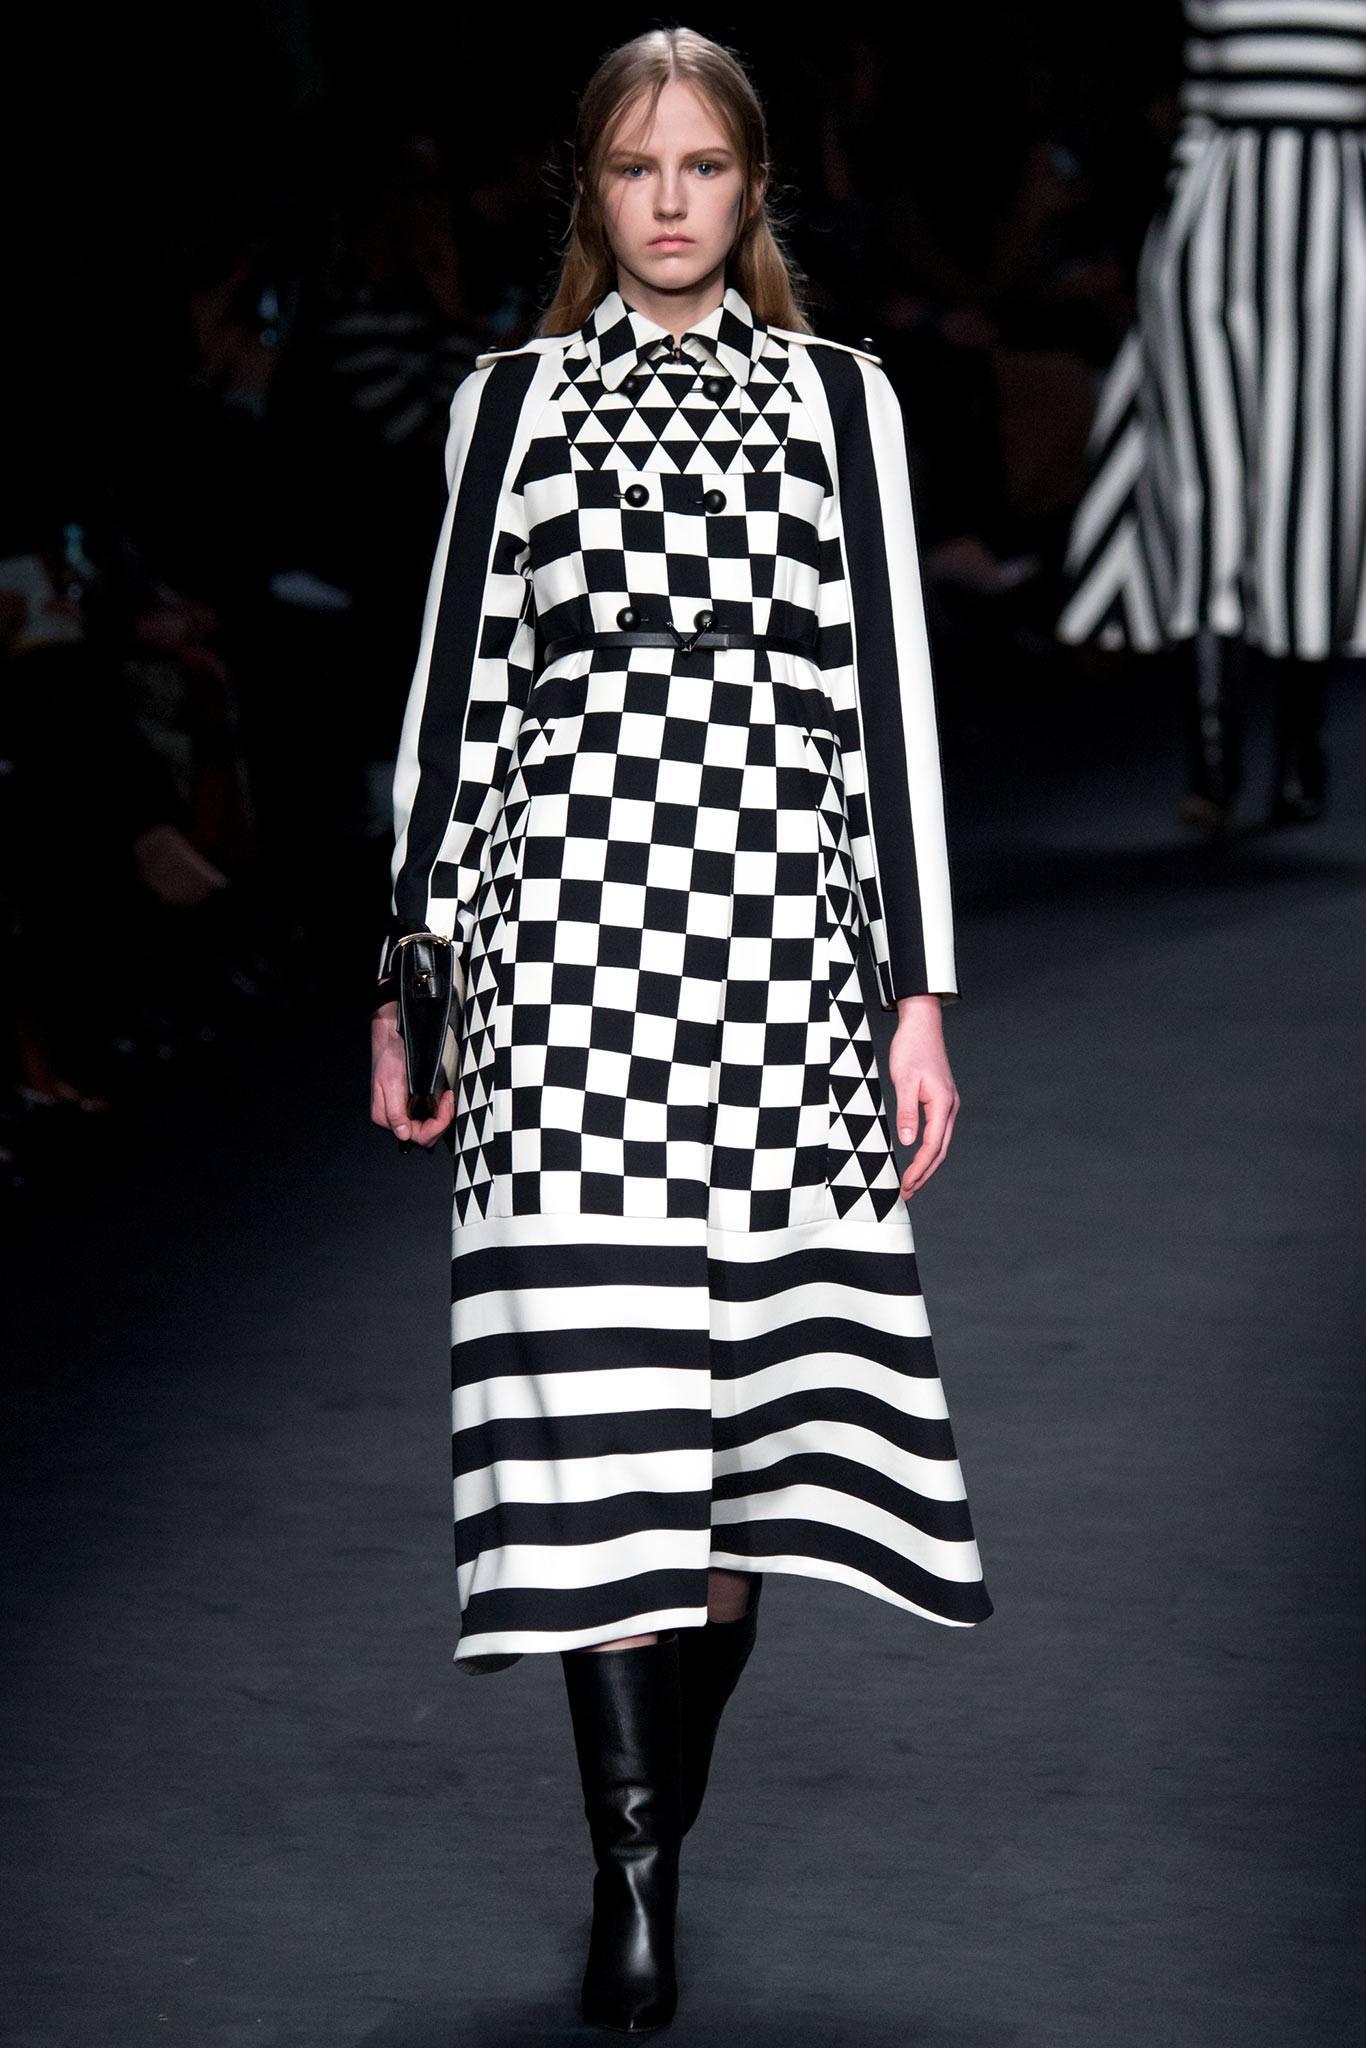 Black and white fashion trend 2018 6